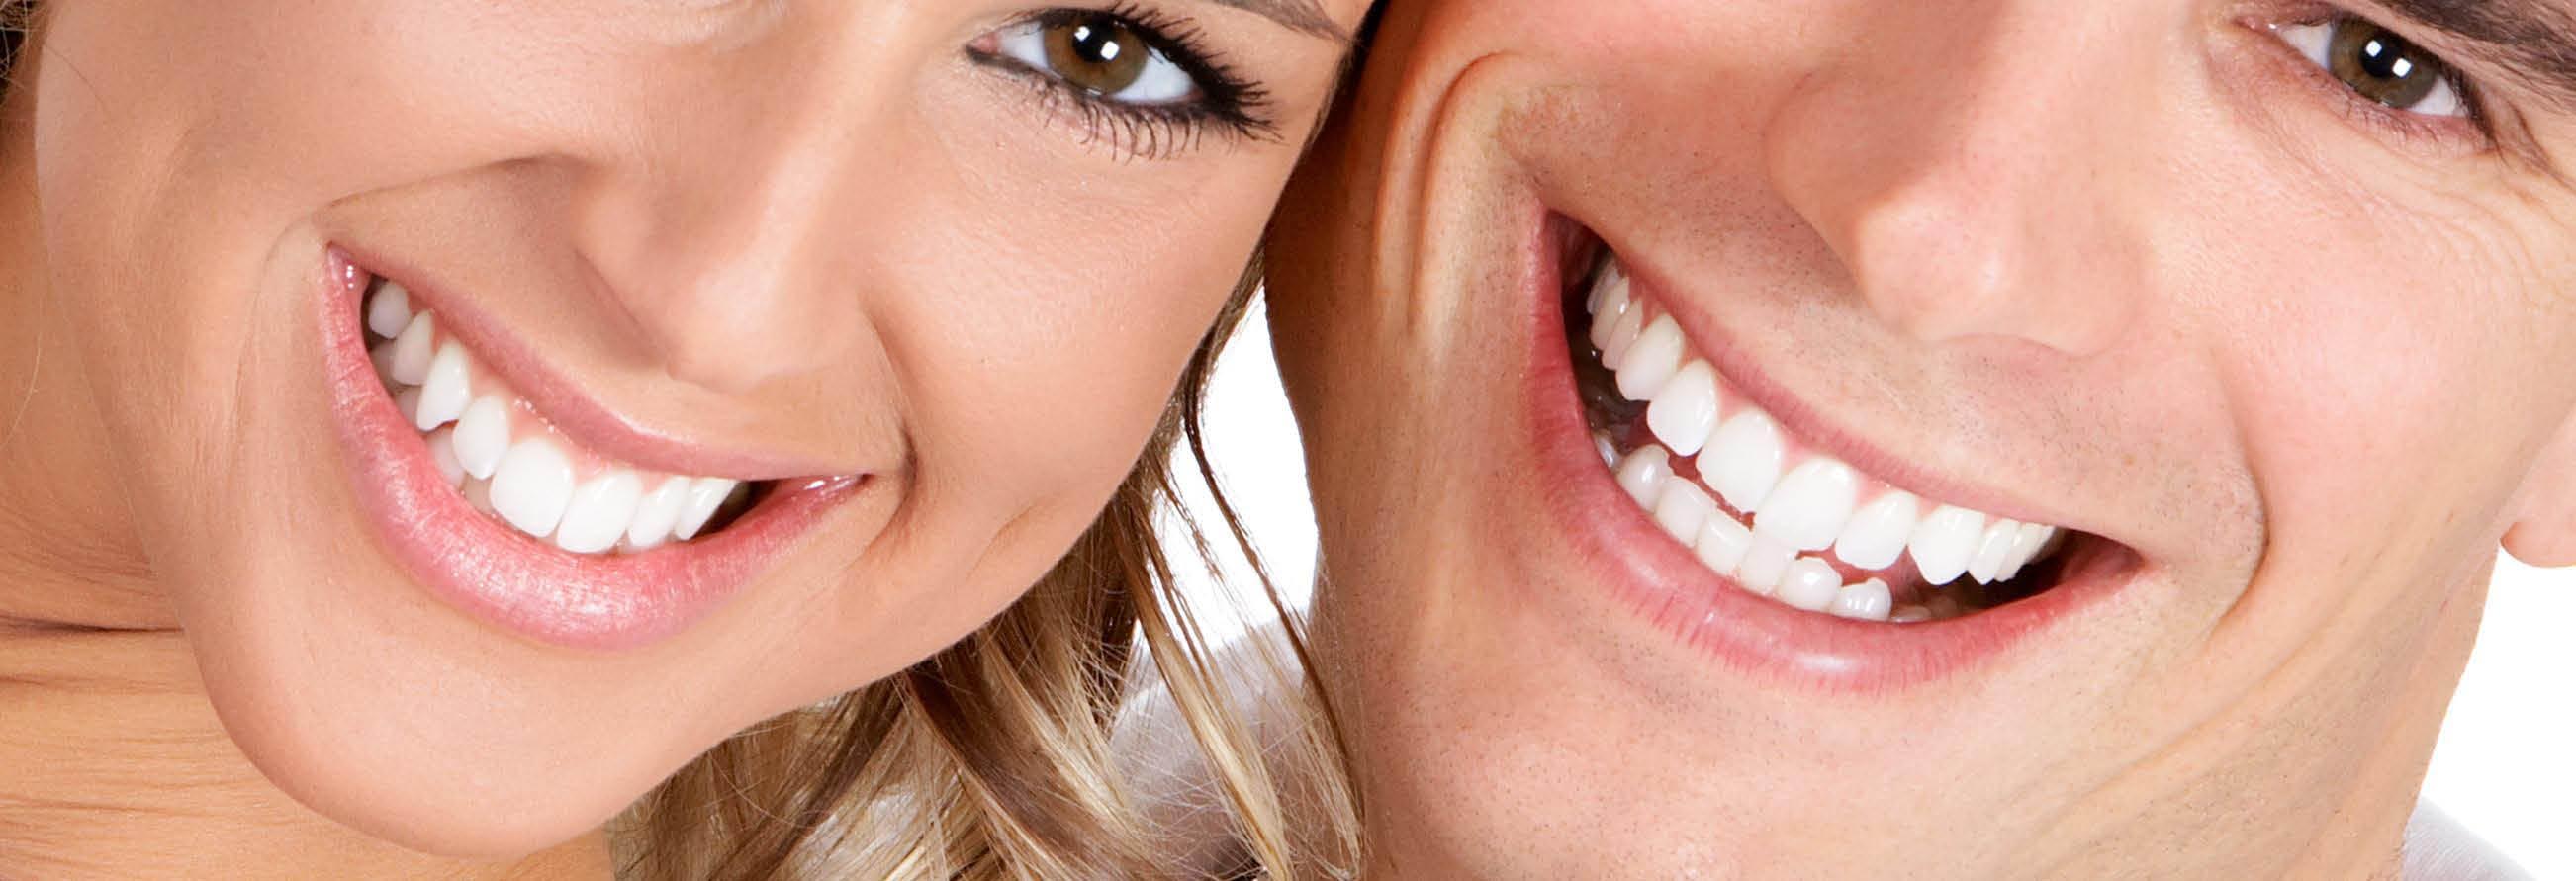 l.a.n.u. dental complete dental services teeth whitening cincinnati ohio